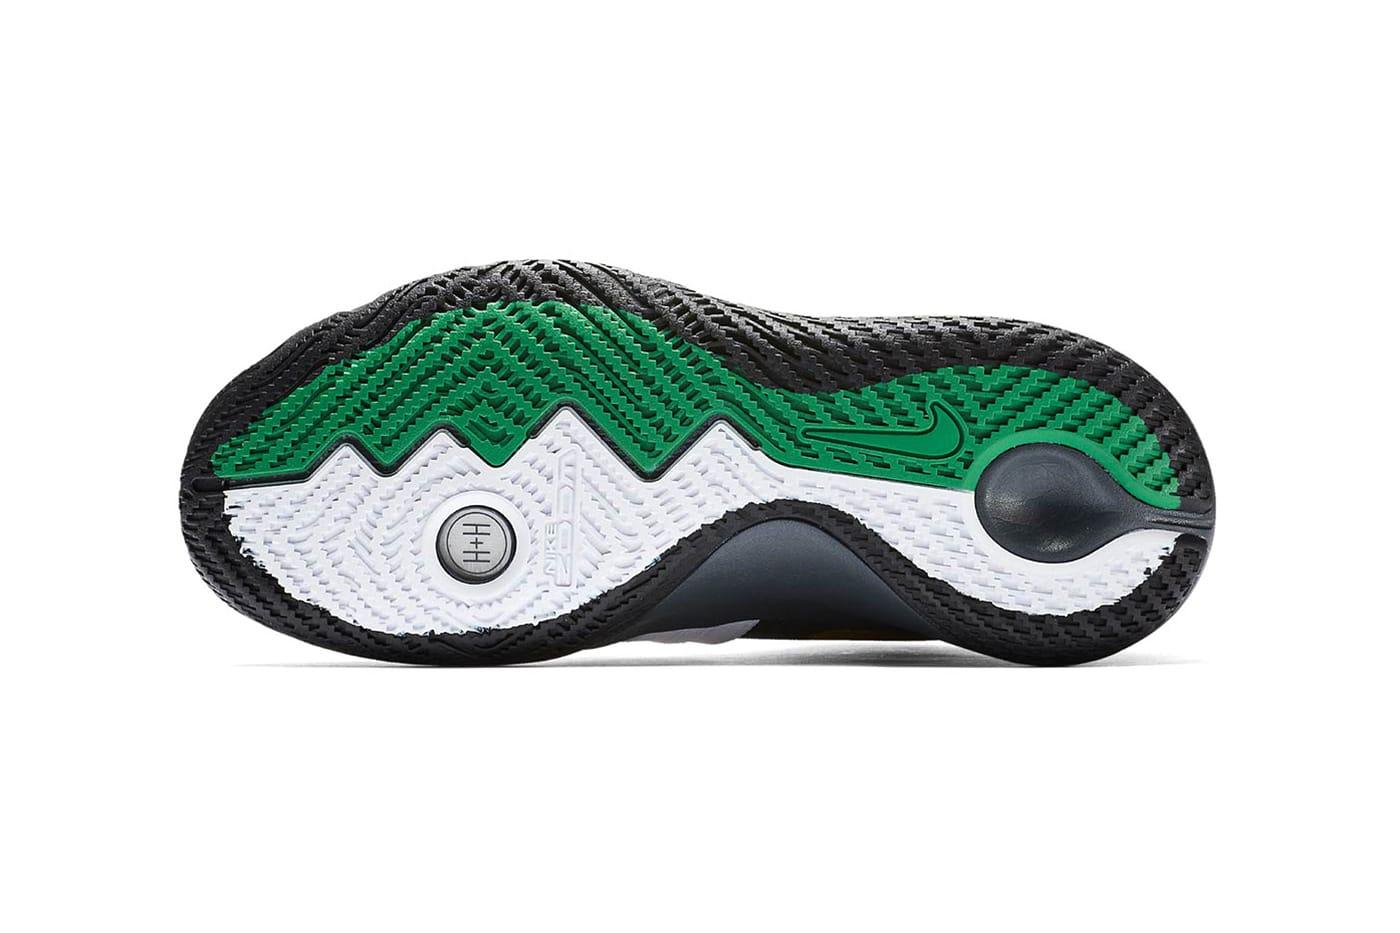 Nike Kyrie Flytrap Celtics   HYPEBEAST